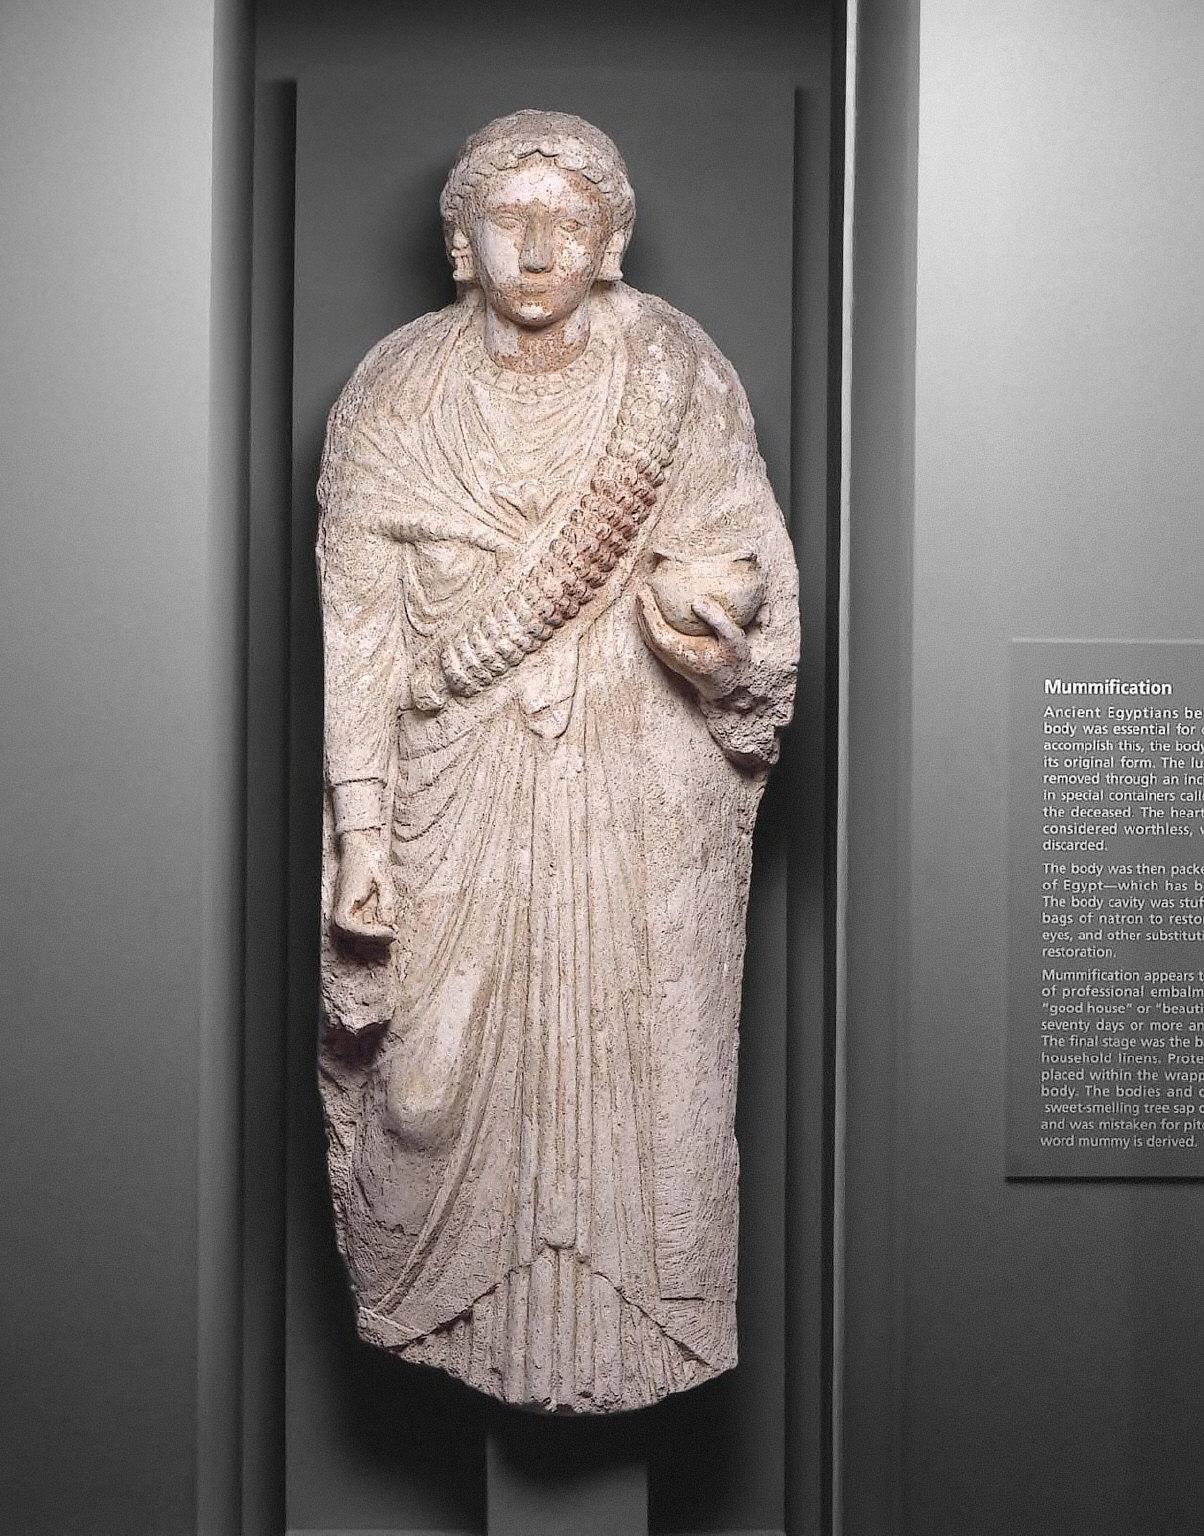 Portrait stele of a woman